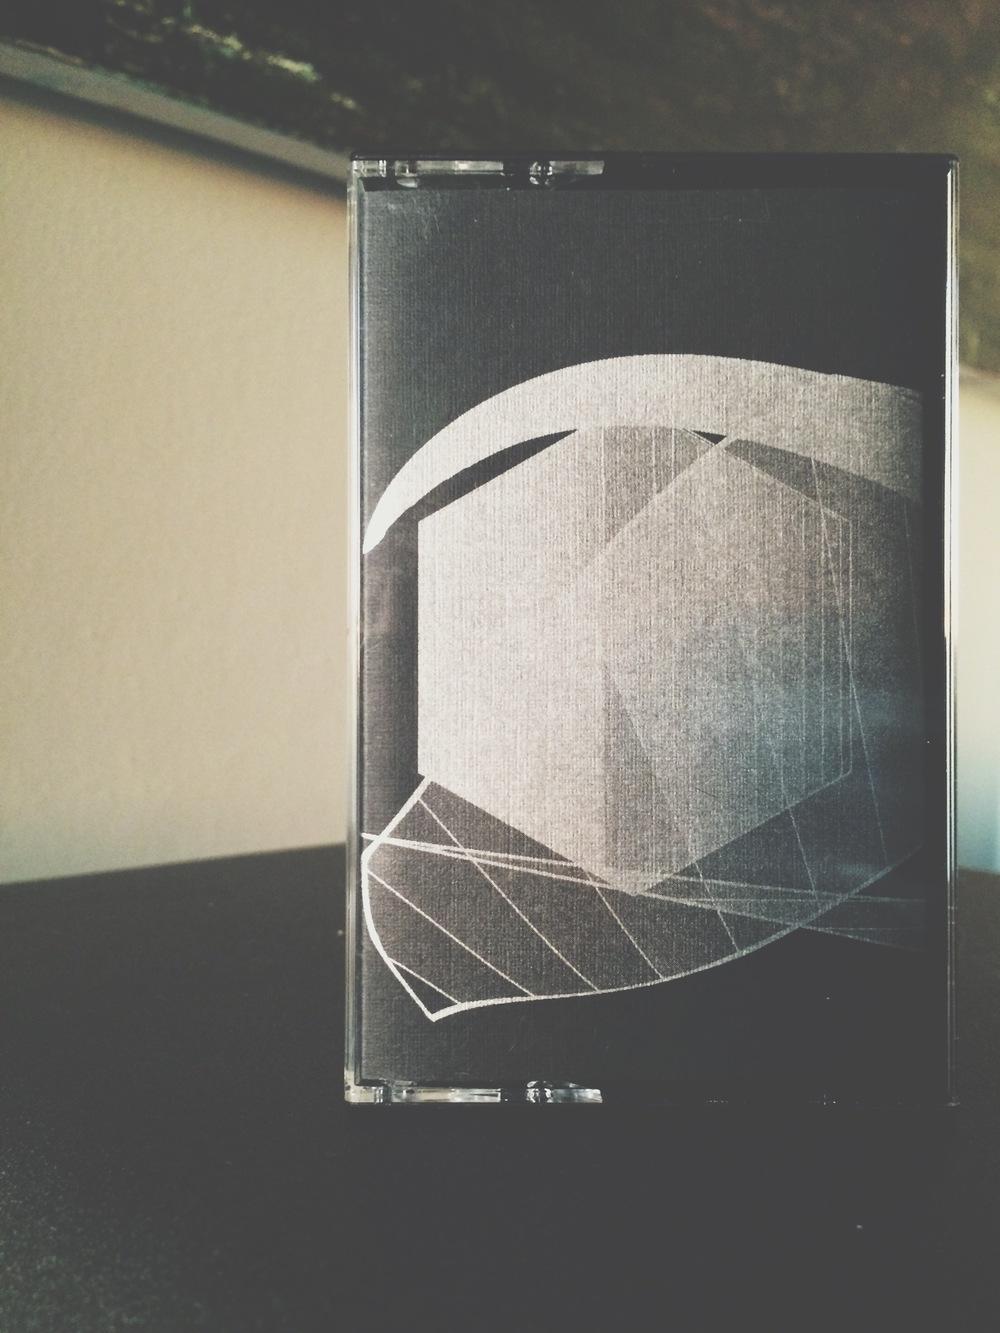 02. Hiroshi Hasegawa : Sasha Darko - SNakes : Seagulls.jpg